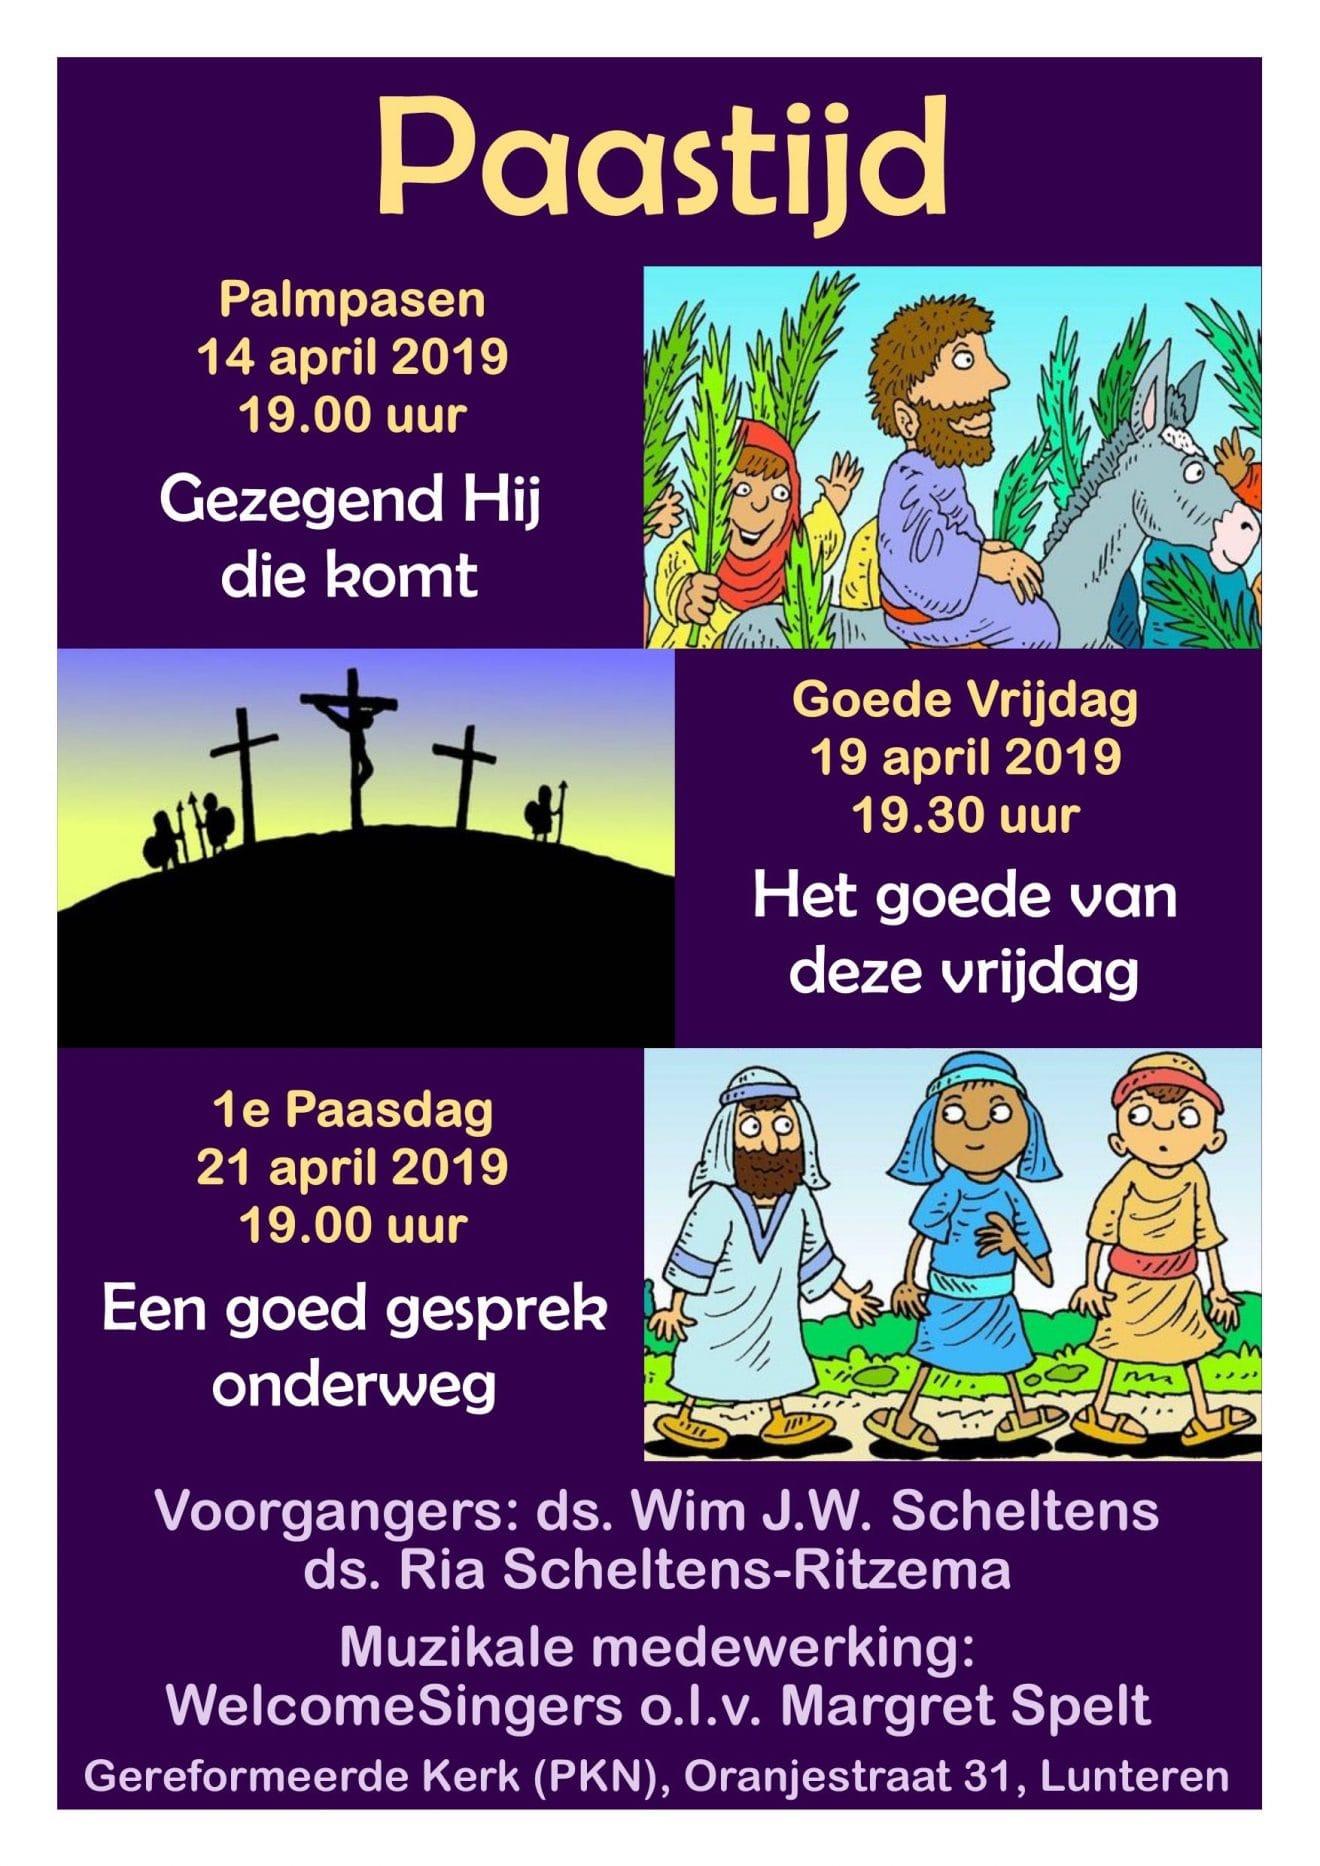 Paastijd 2019